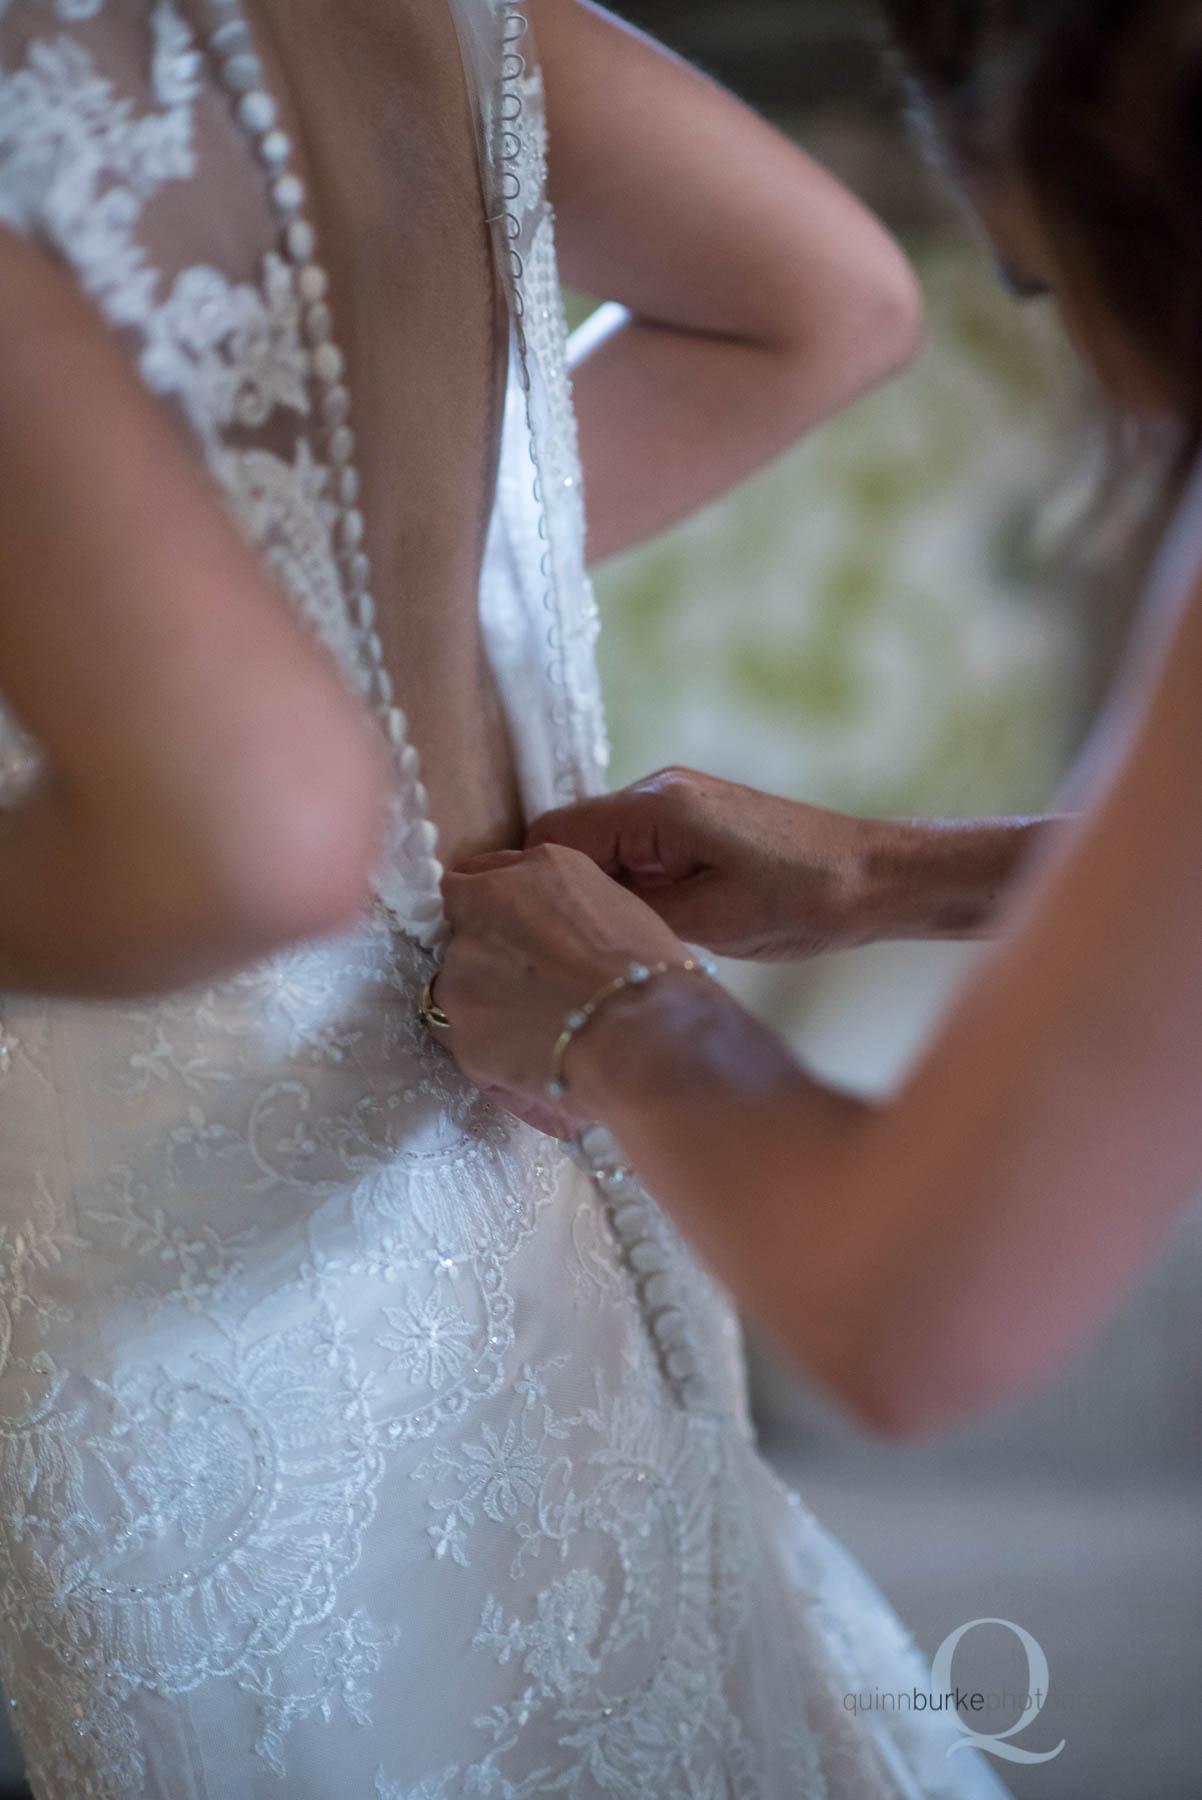 buttoning bride's dress before wedding at Green Villa Barn